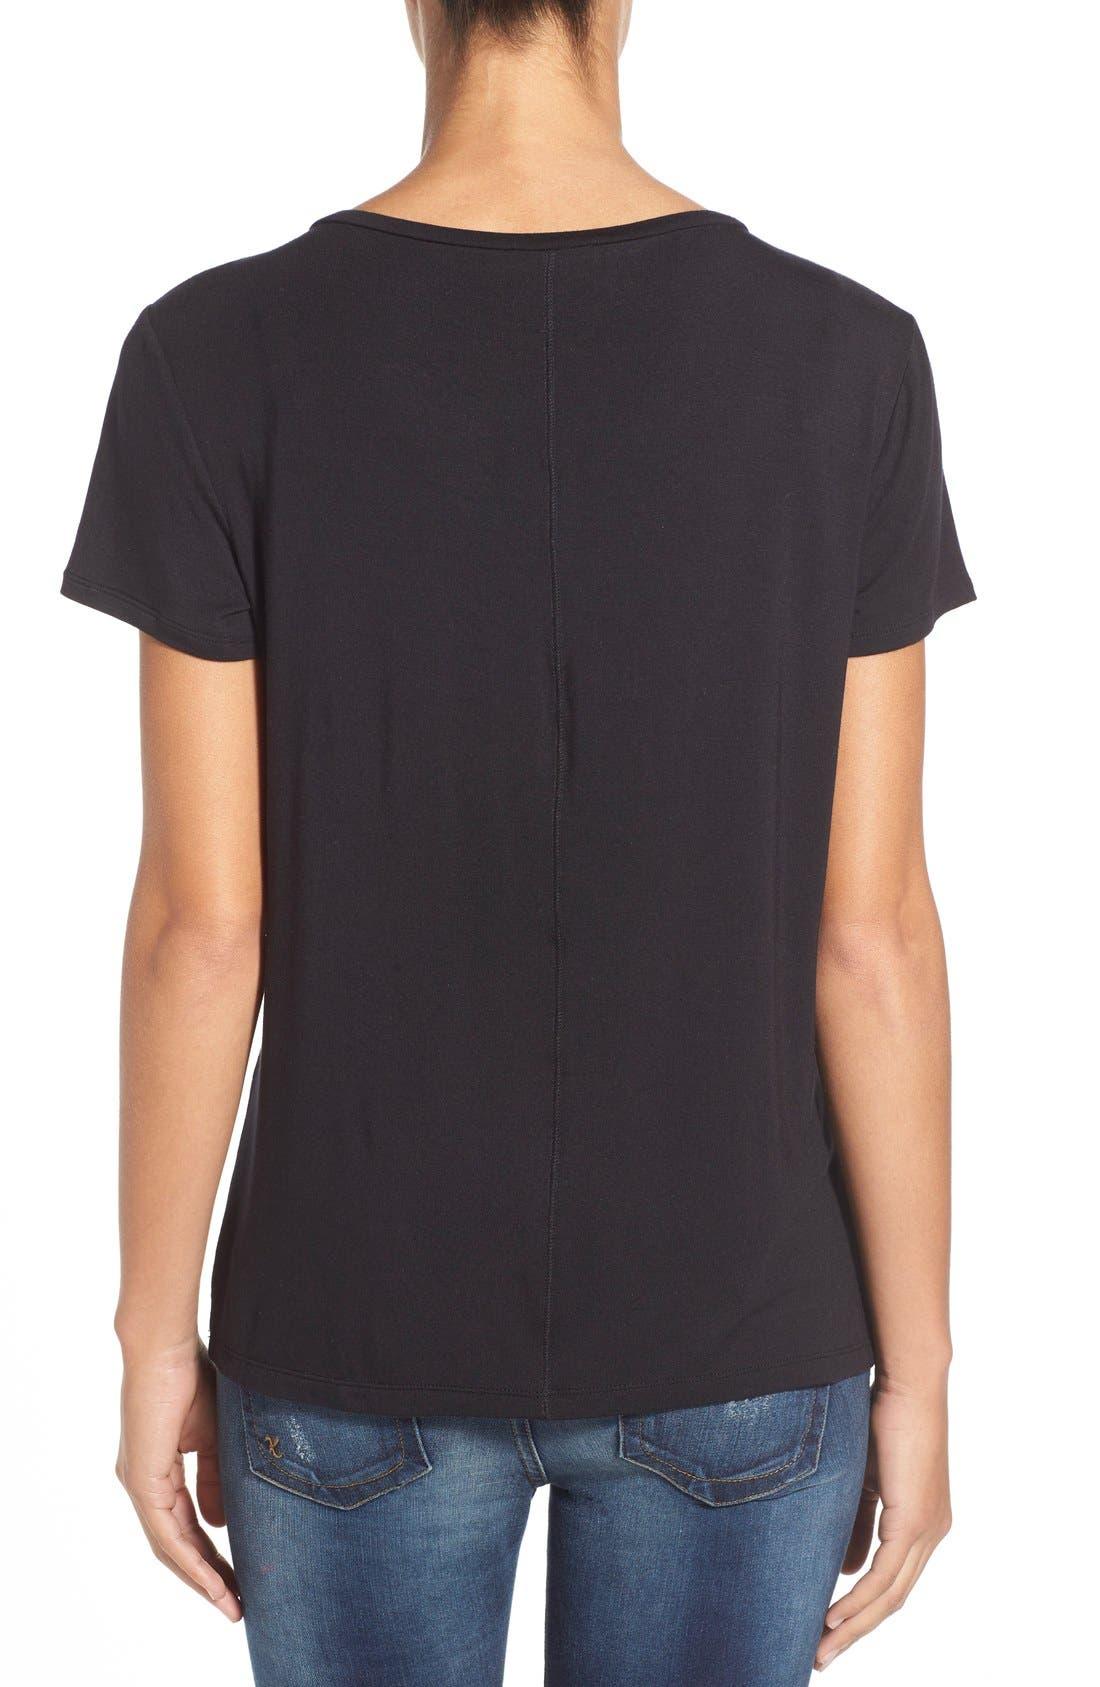 Alternate Image 2  - Halogen® Modal Jersey V-Neck Tee (Regular & Petite)